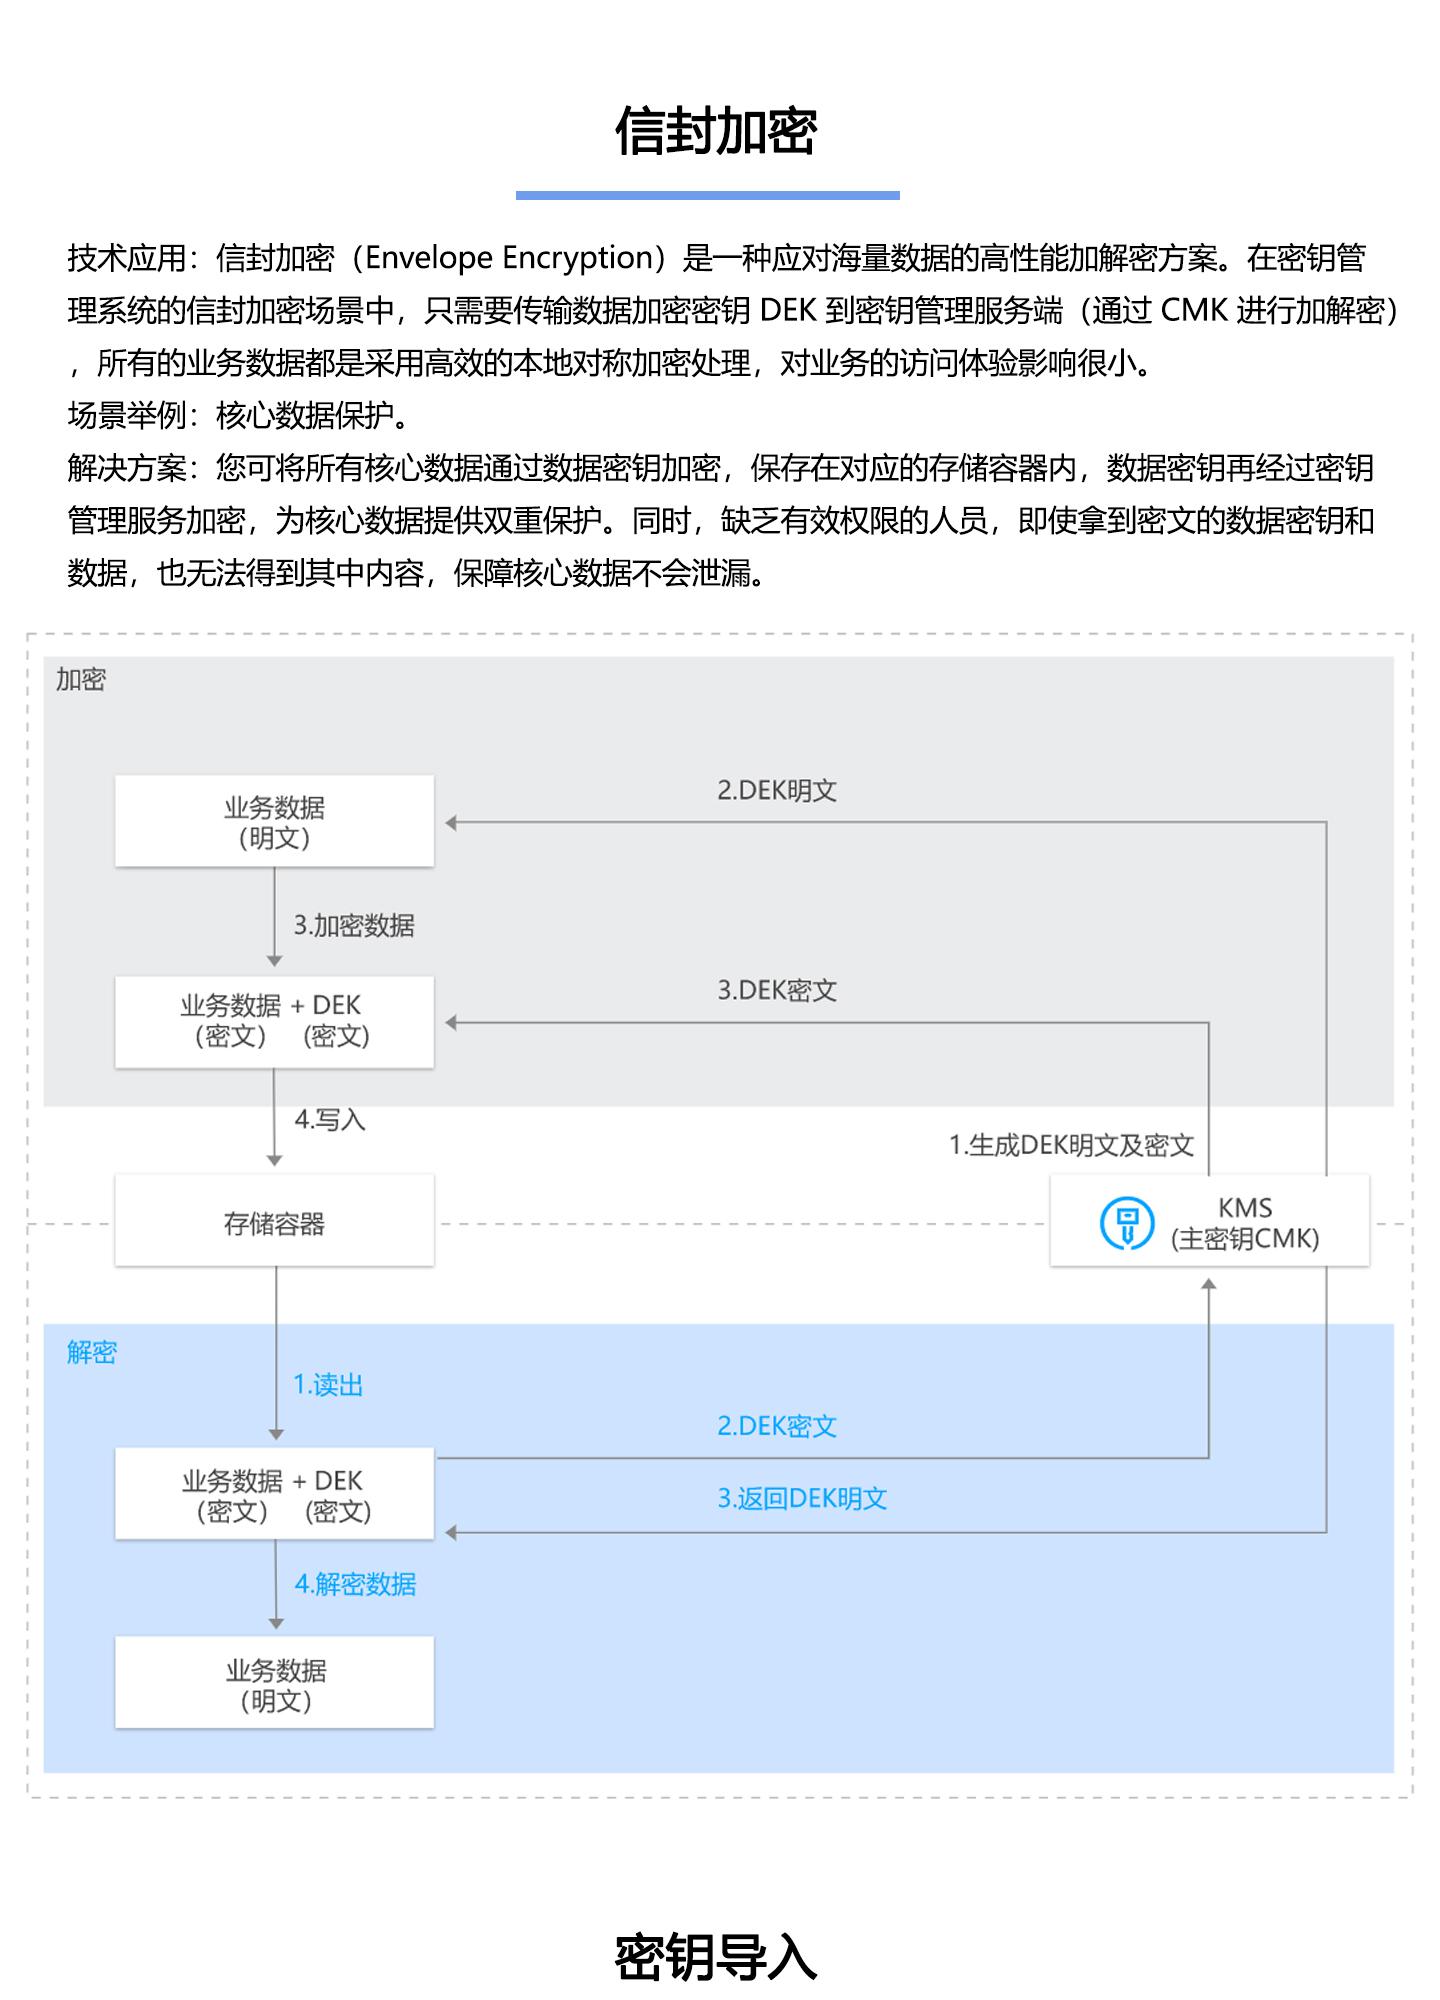 T-Sec-密钥管理系统1440_04.jpg